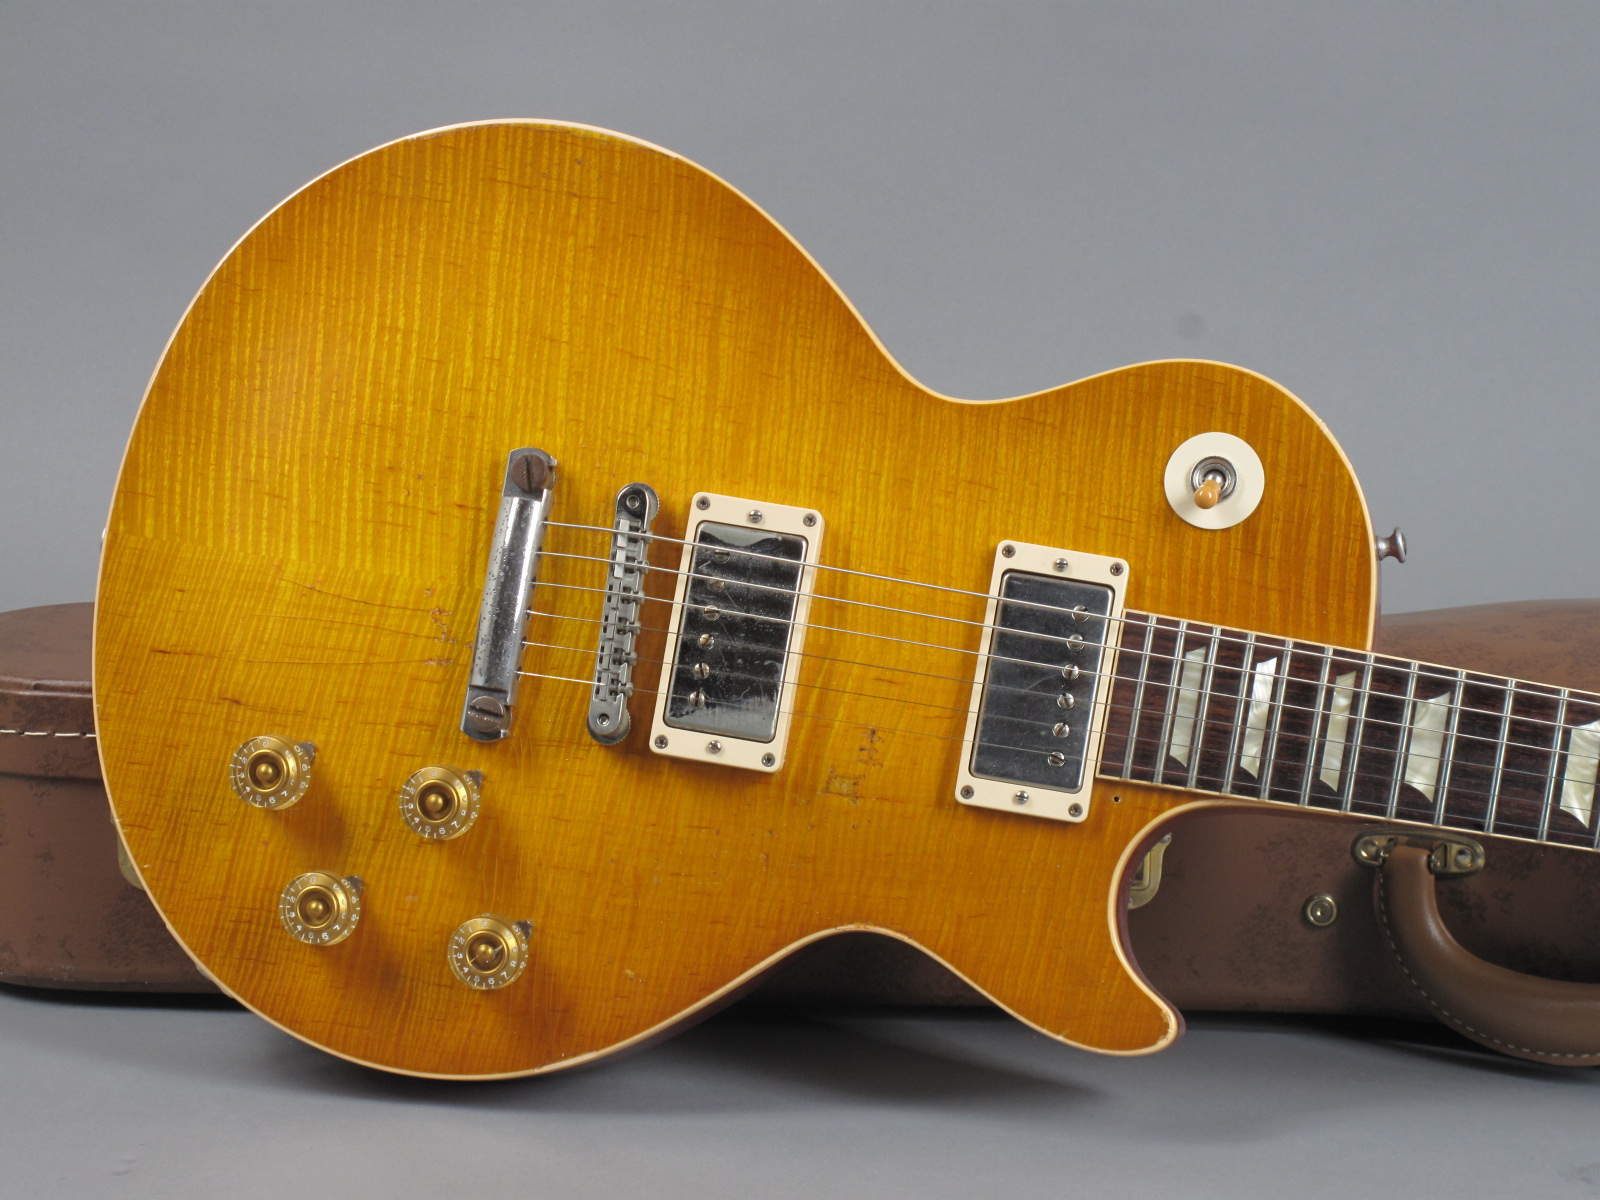 https://guitarpoint.de/app/uploads/products/2012-gibson-1959-les-paul-kossoff-standard-tom-murphy-aged/2012_Gibson-Les-Paul-Paul-Kossoff-Aged-KOSSOFF76_8.jpg